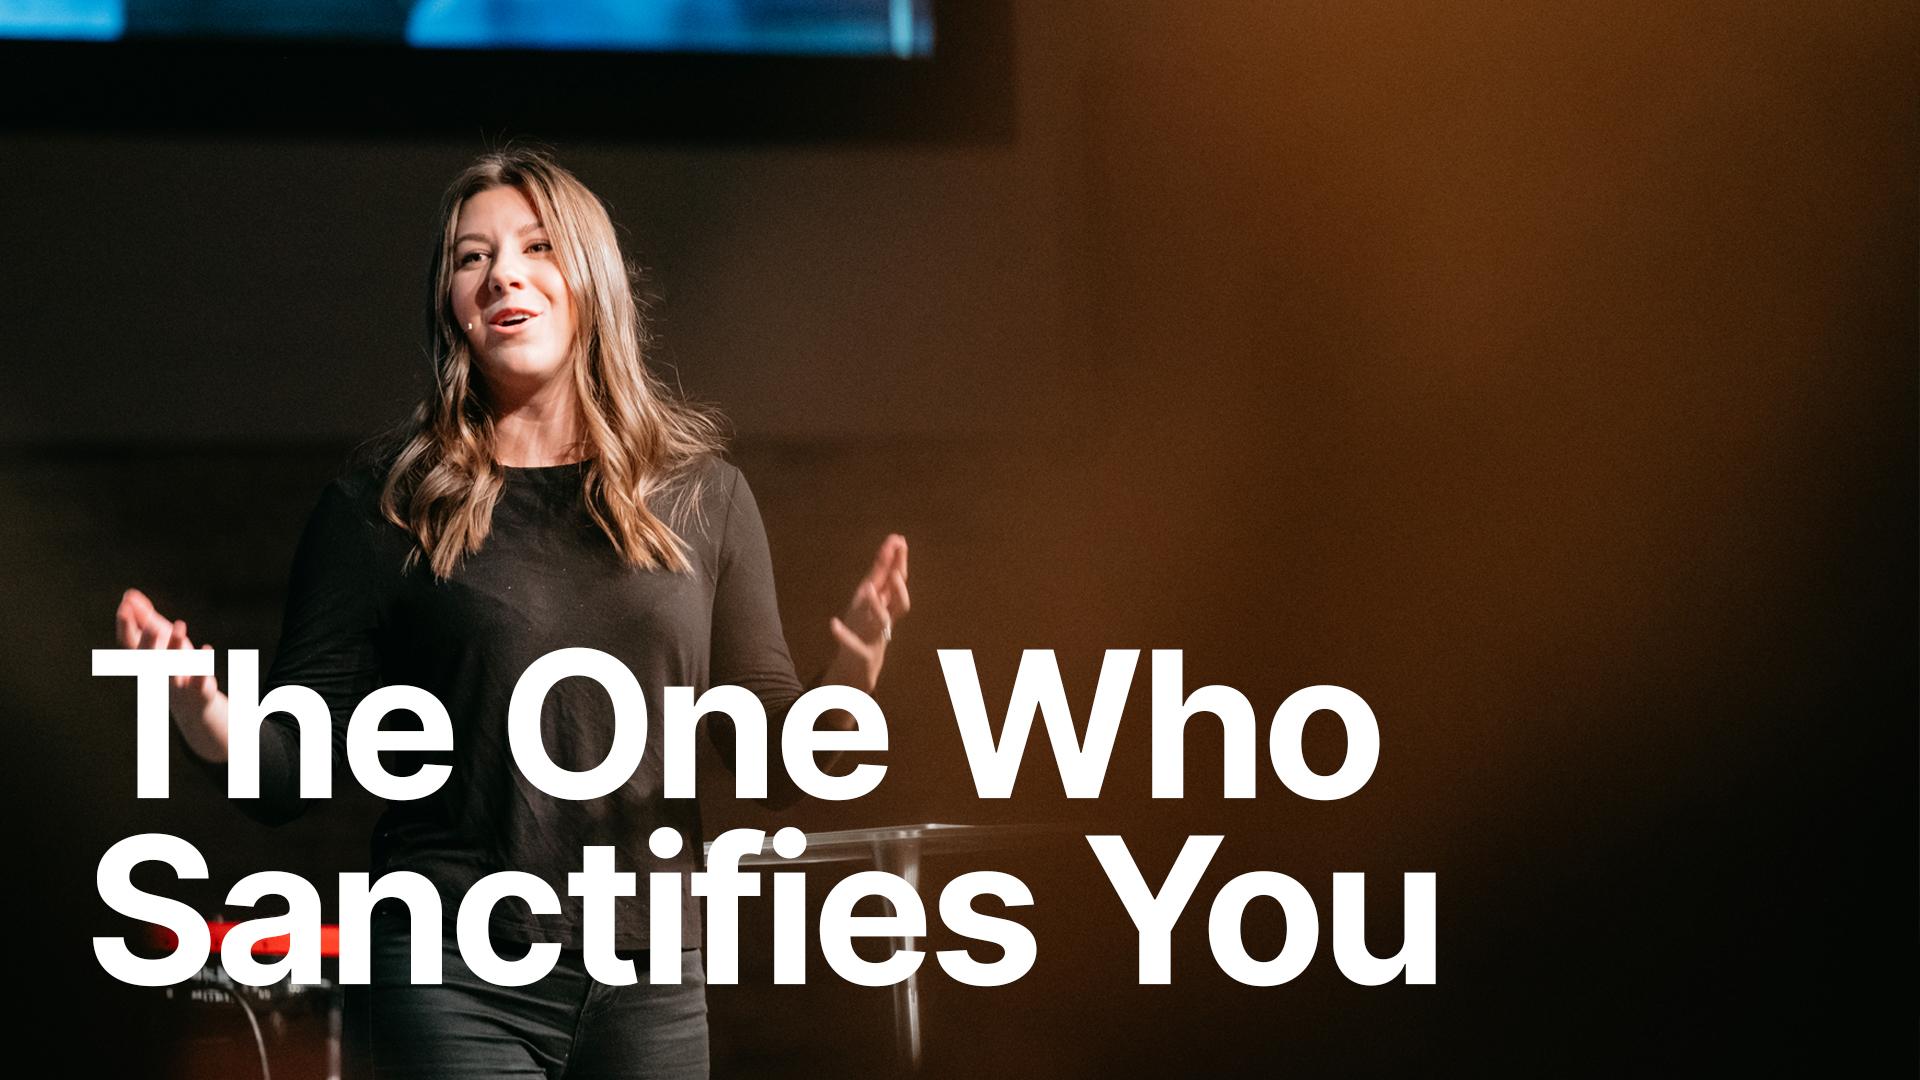 Rachelle Lefebvre preaching